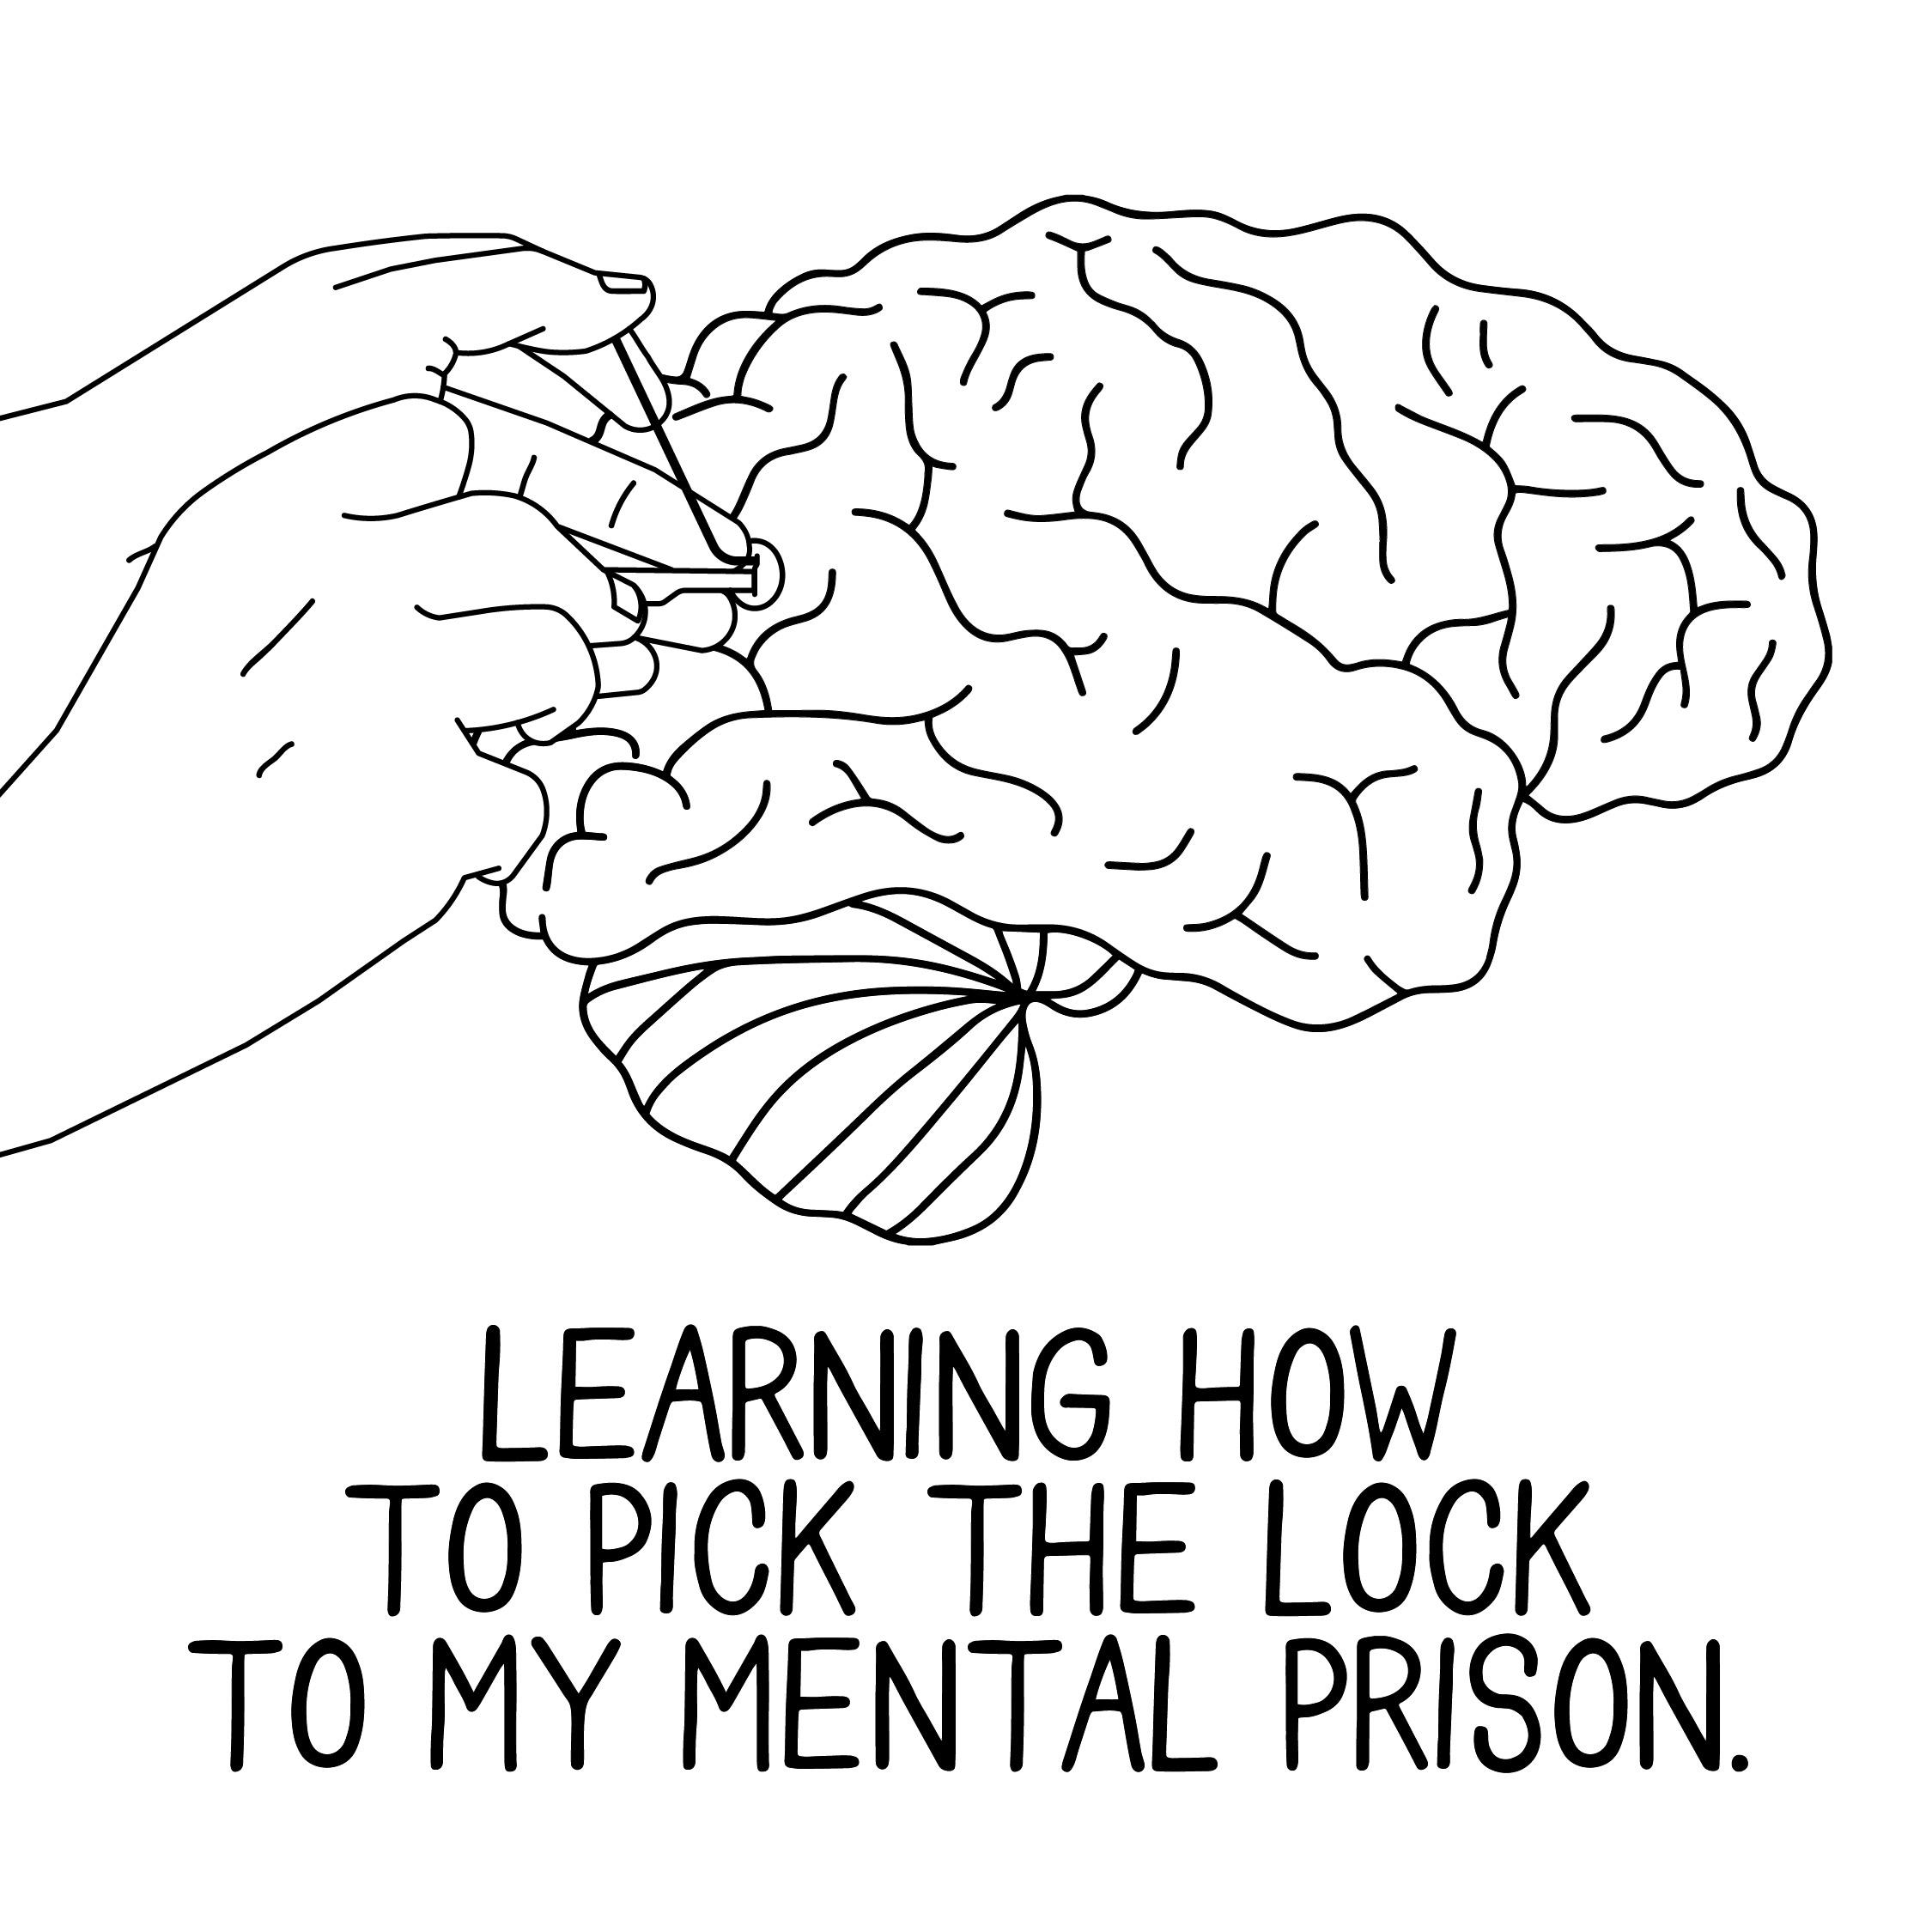 mentalprison-01.jpg